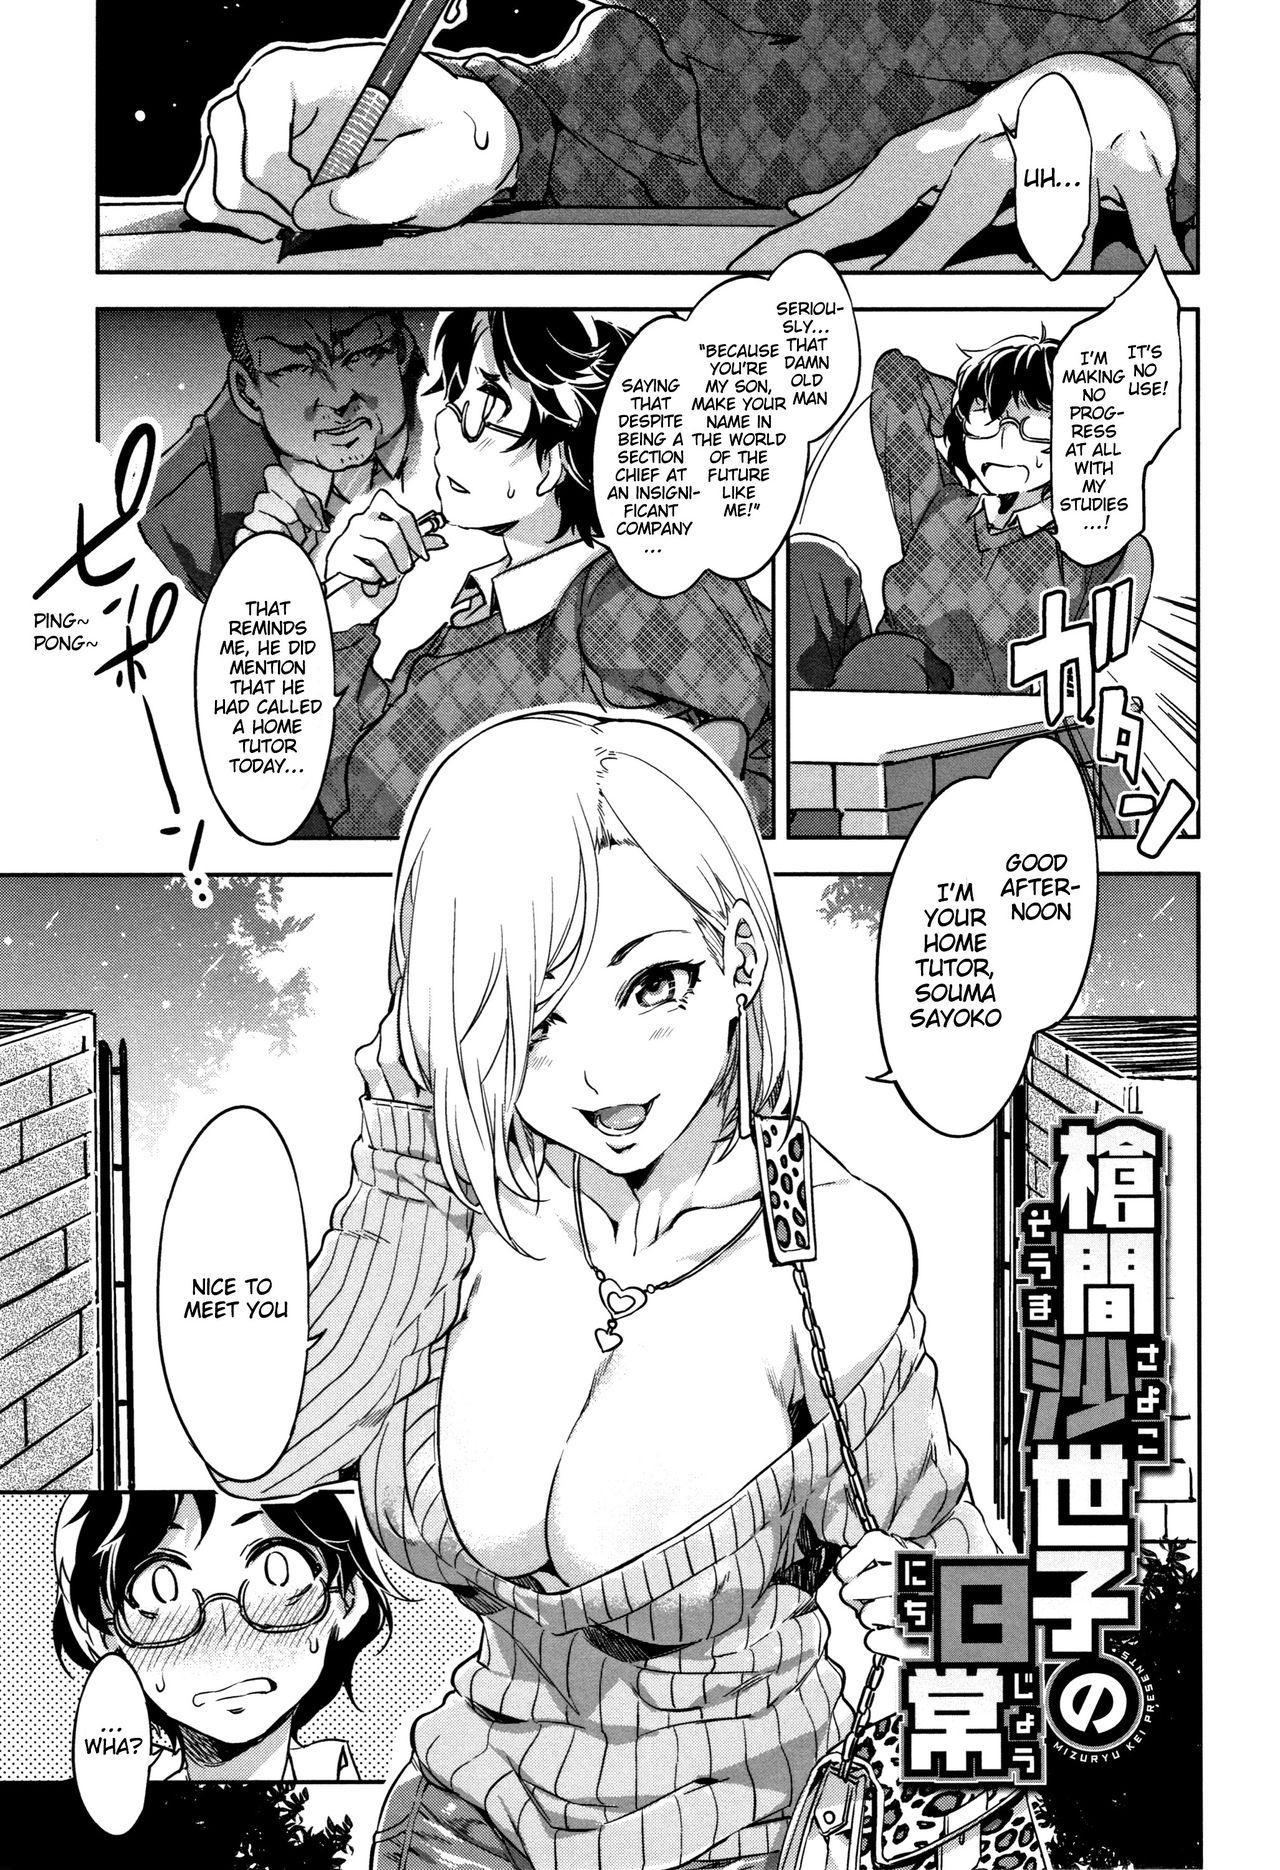 Teisou Kannen ZERO Shinsouban 1 47